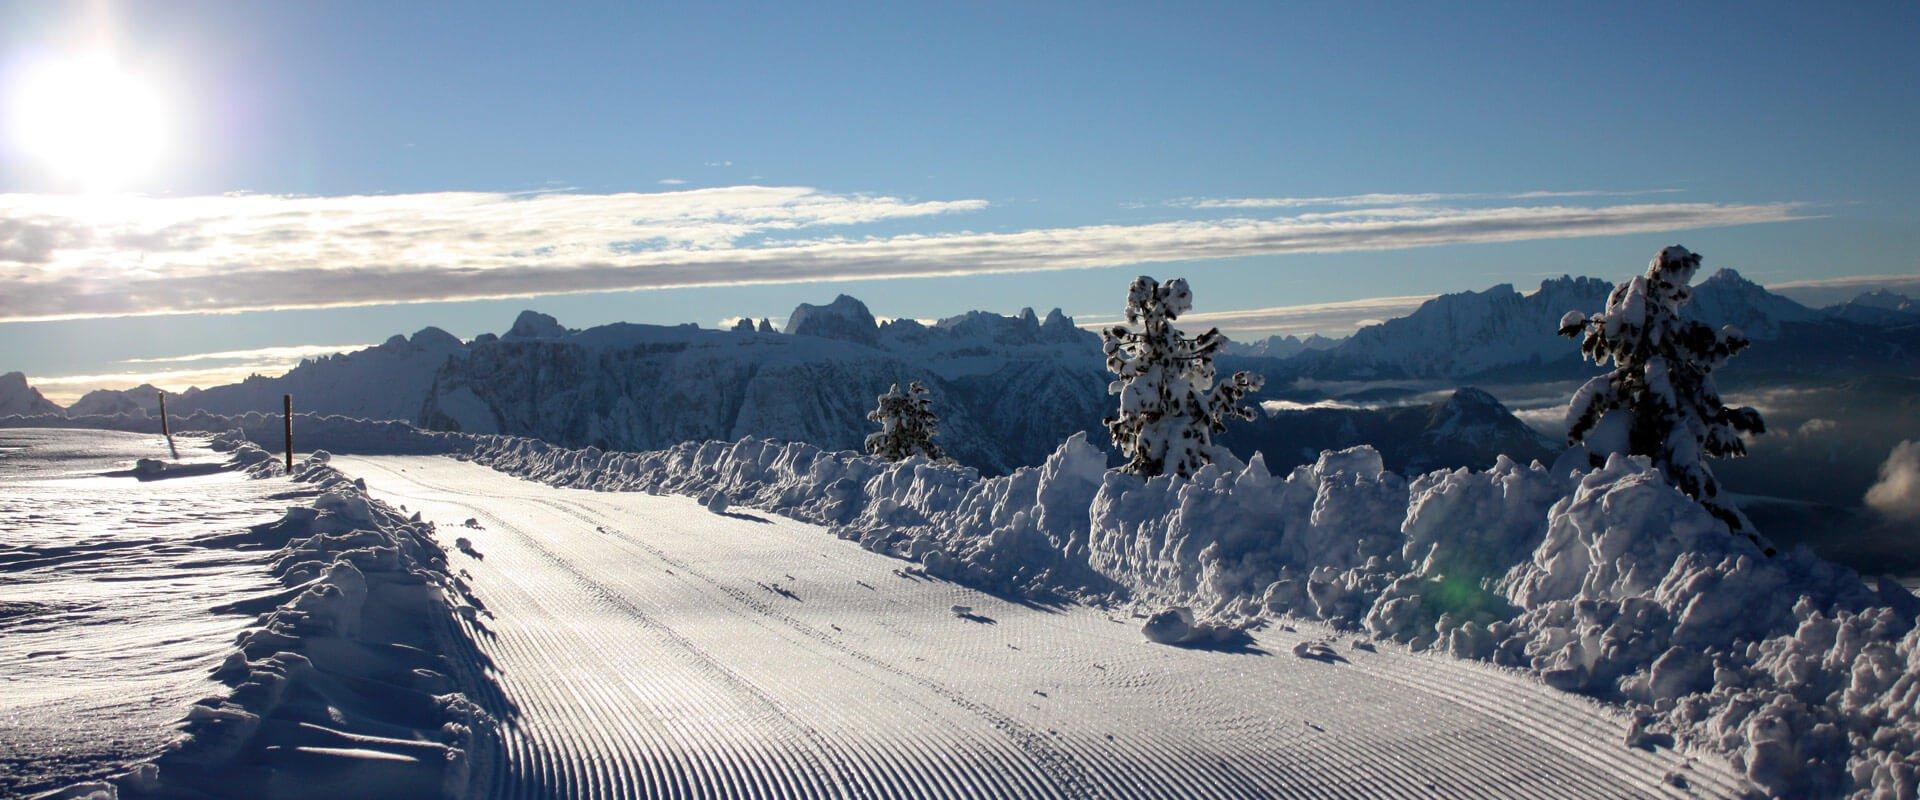 winterurlaub-ritten-04